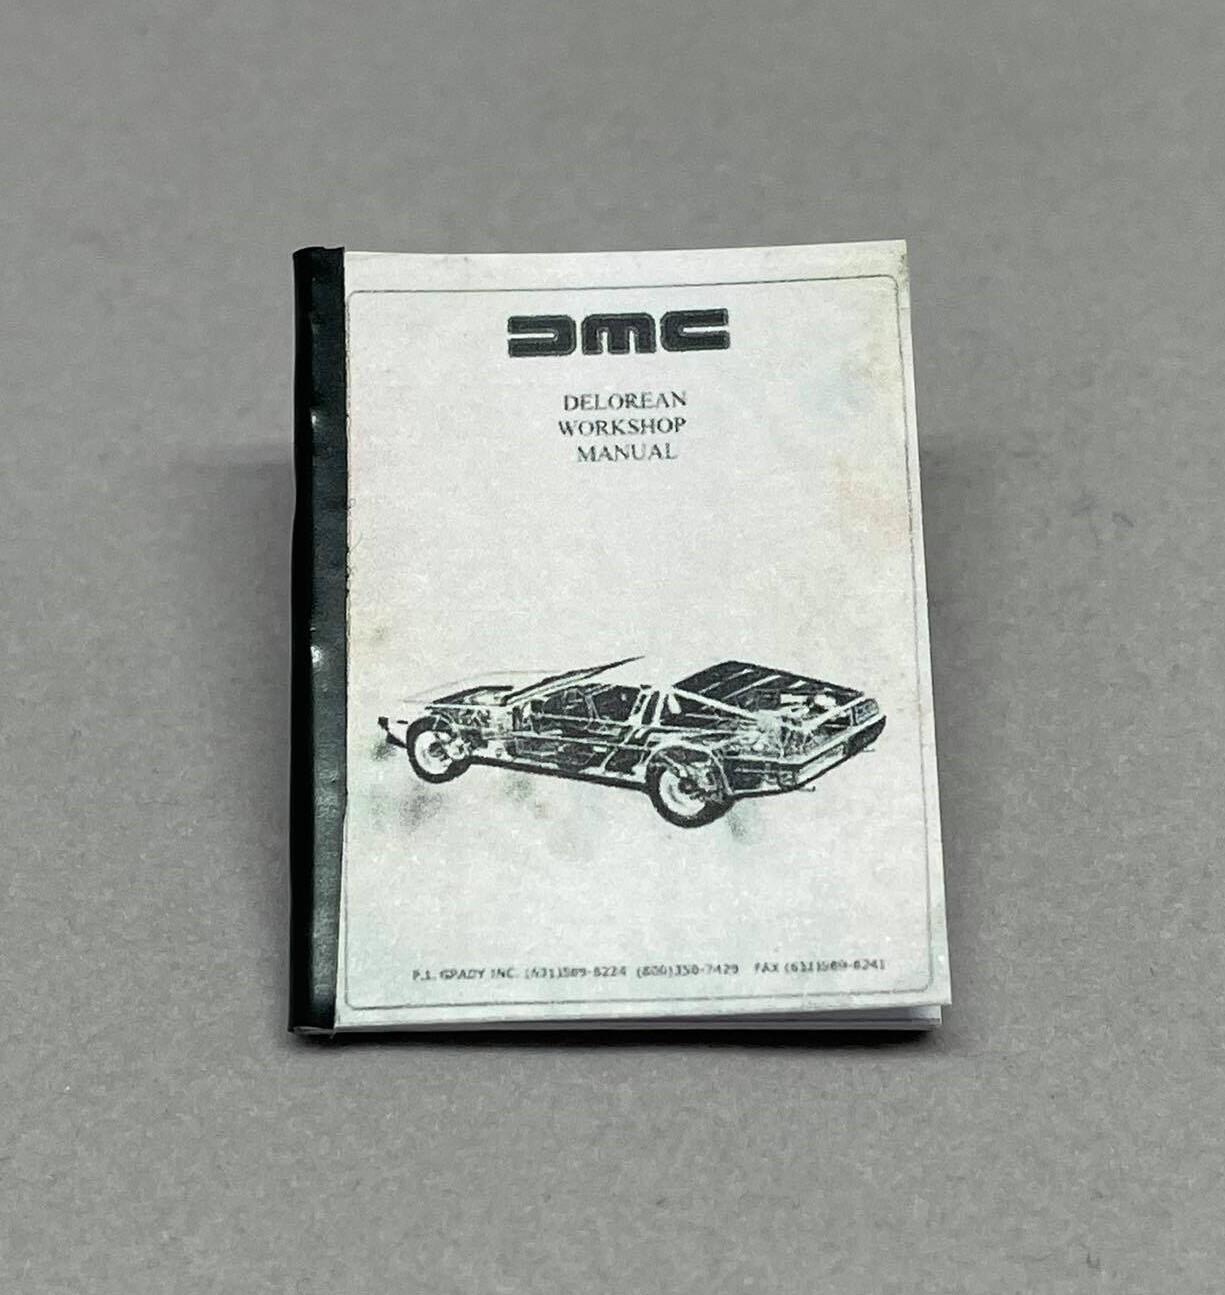 1:8 scale DeLorean Workshop Manual